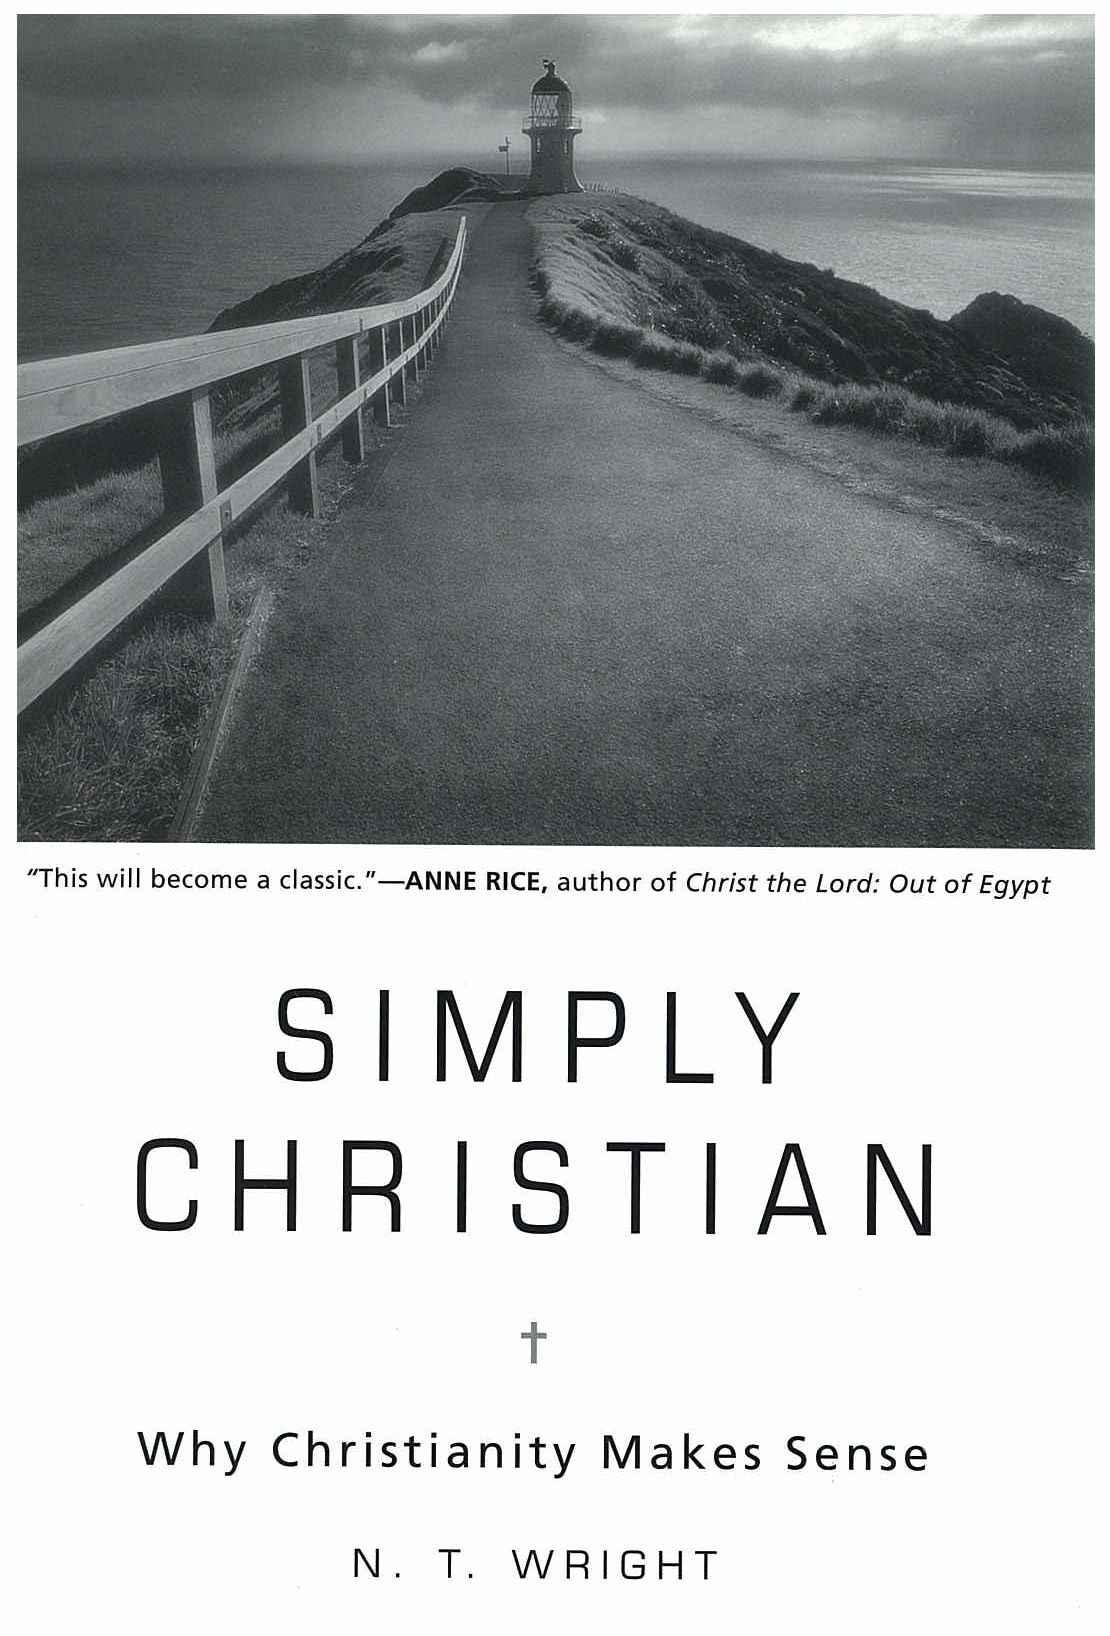 Simply-Christian.jpg